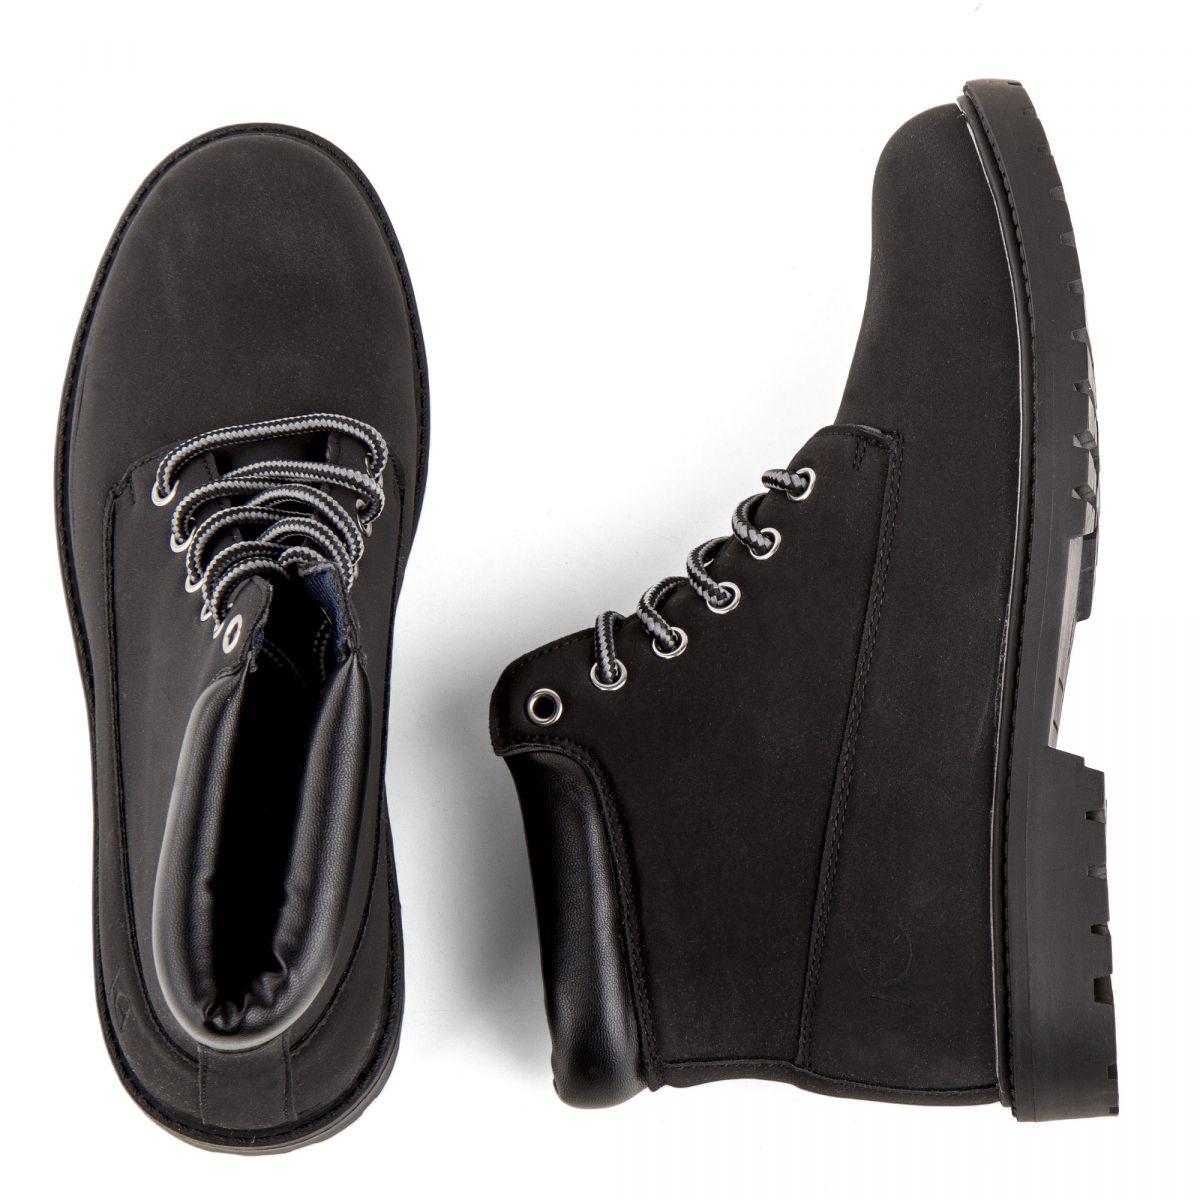 Femme Boots Henry Cotton's À Chaussures Montantes Costa Mustardblack F3KTl1Jc